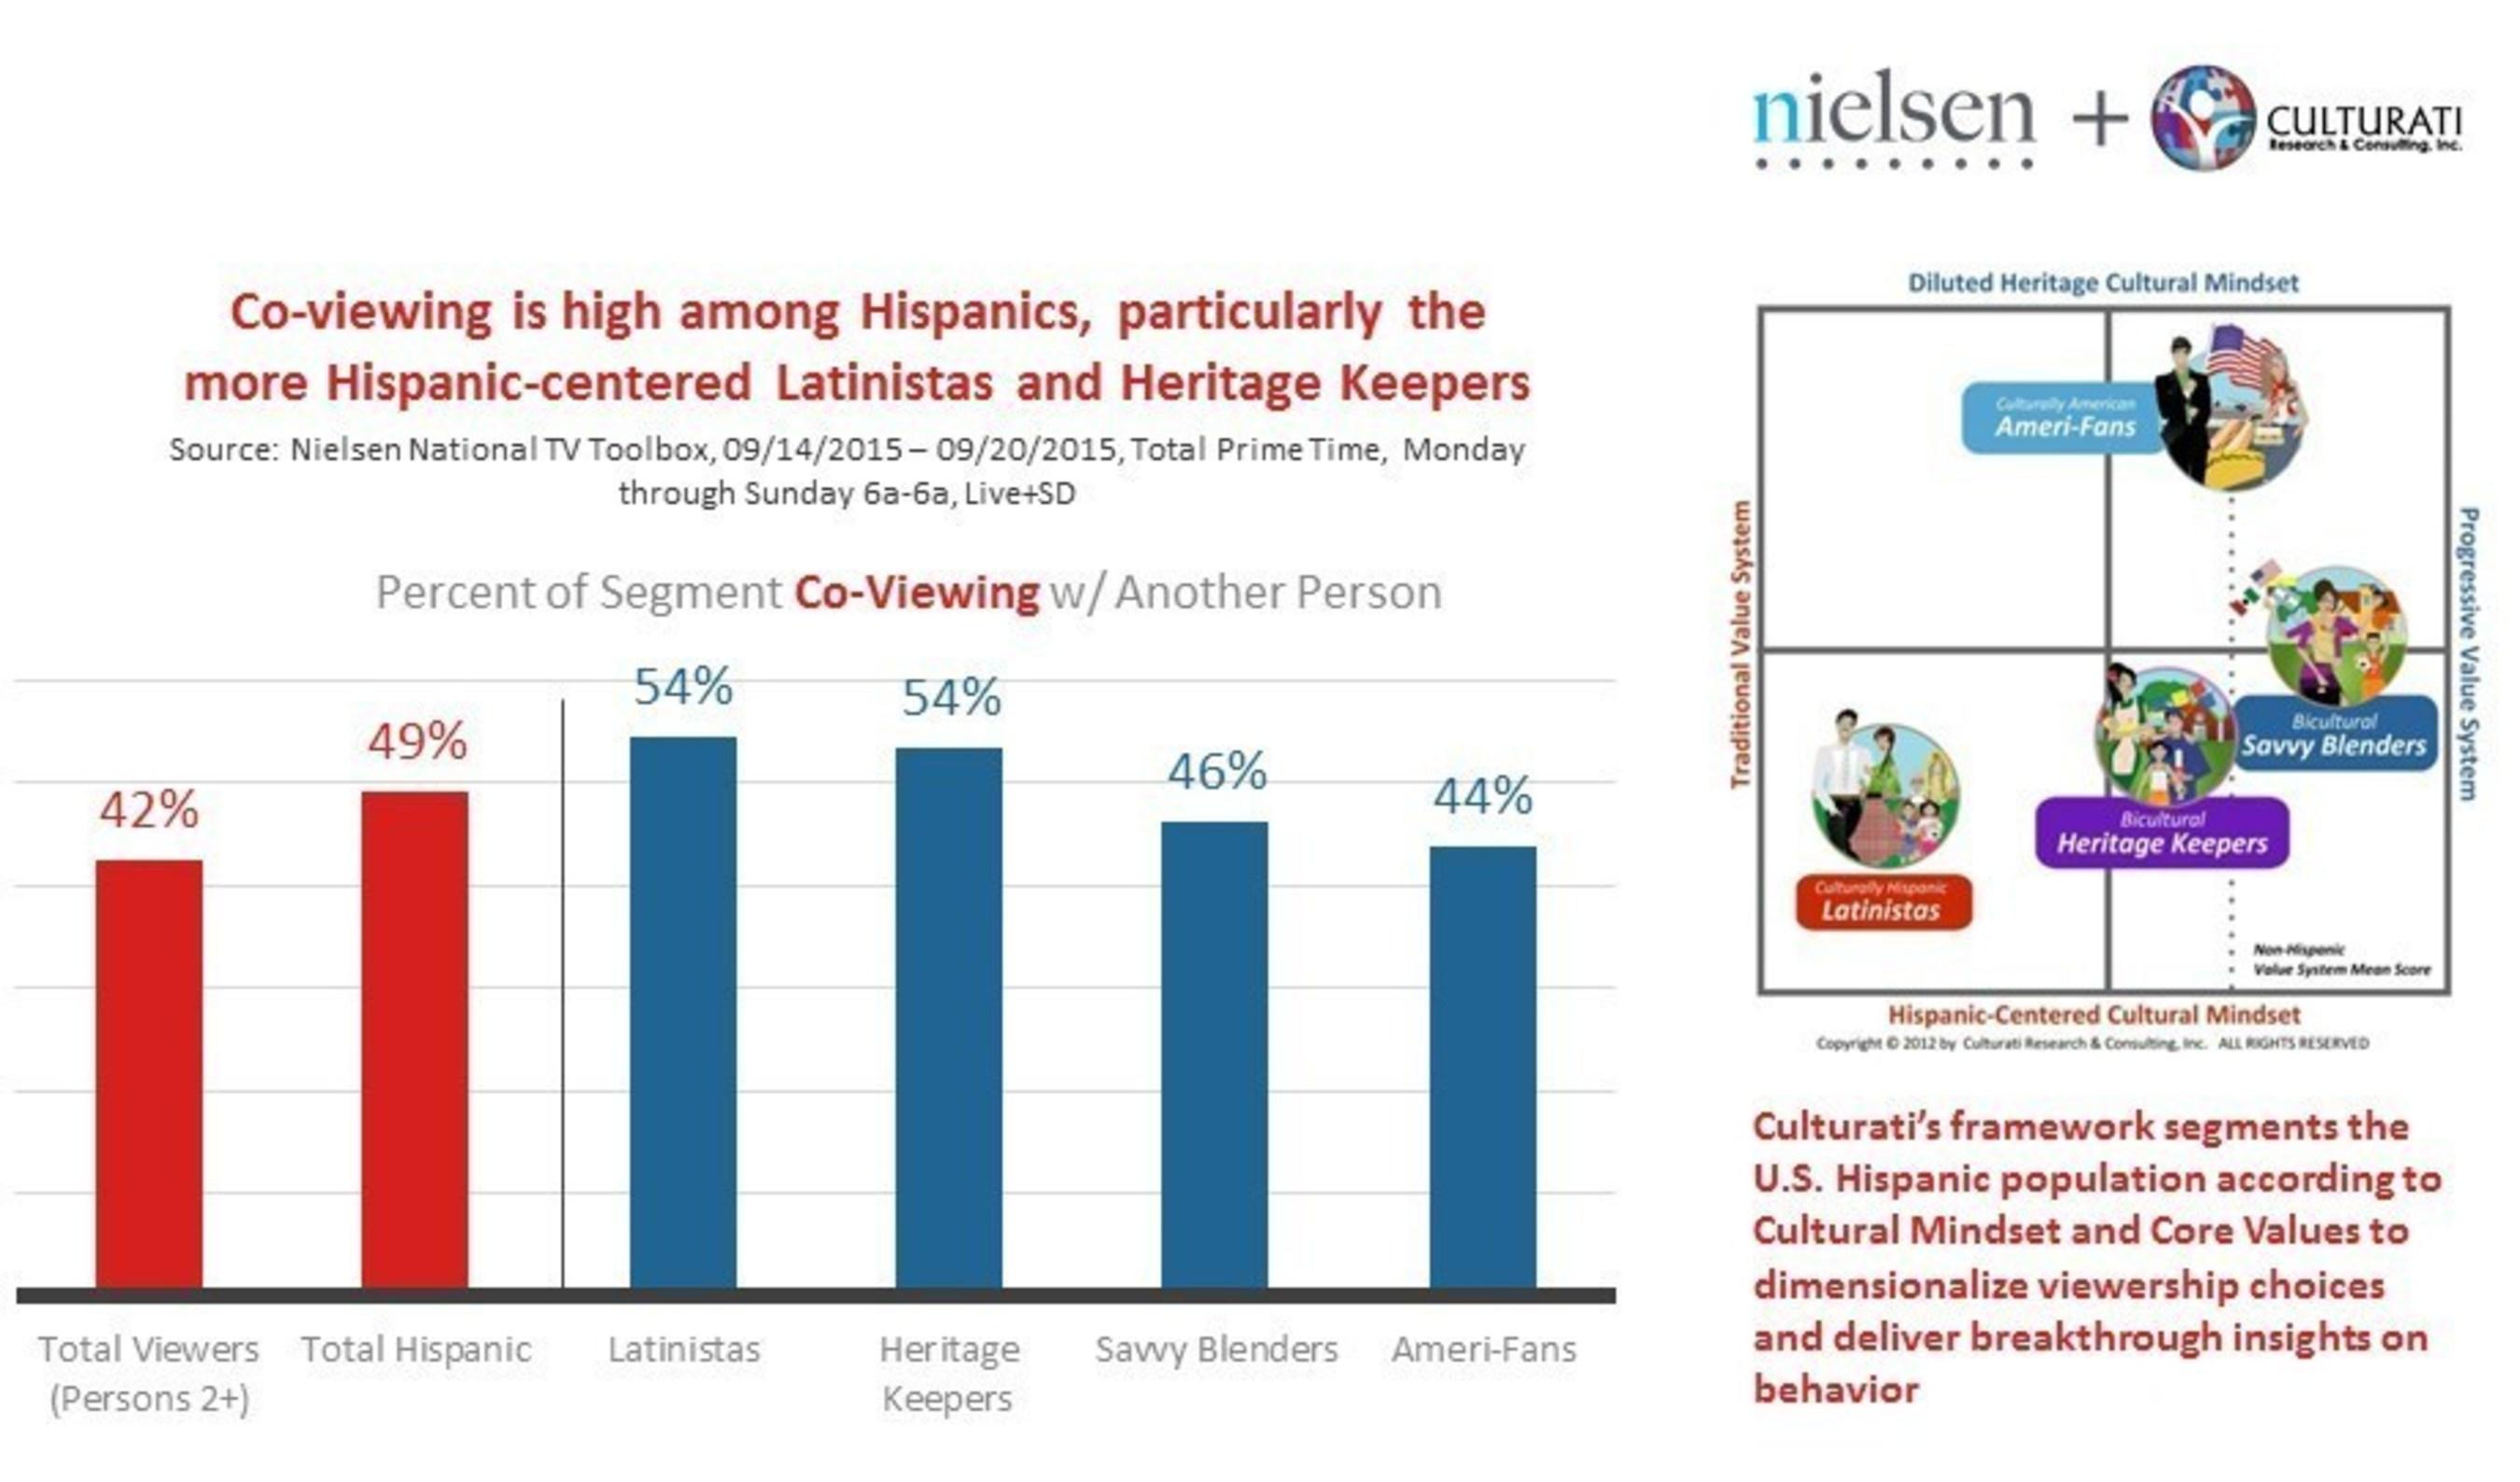 Exhibit 1: U.S. Hispanic co-viewing by Culturati Segment